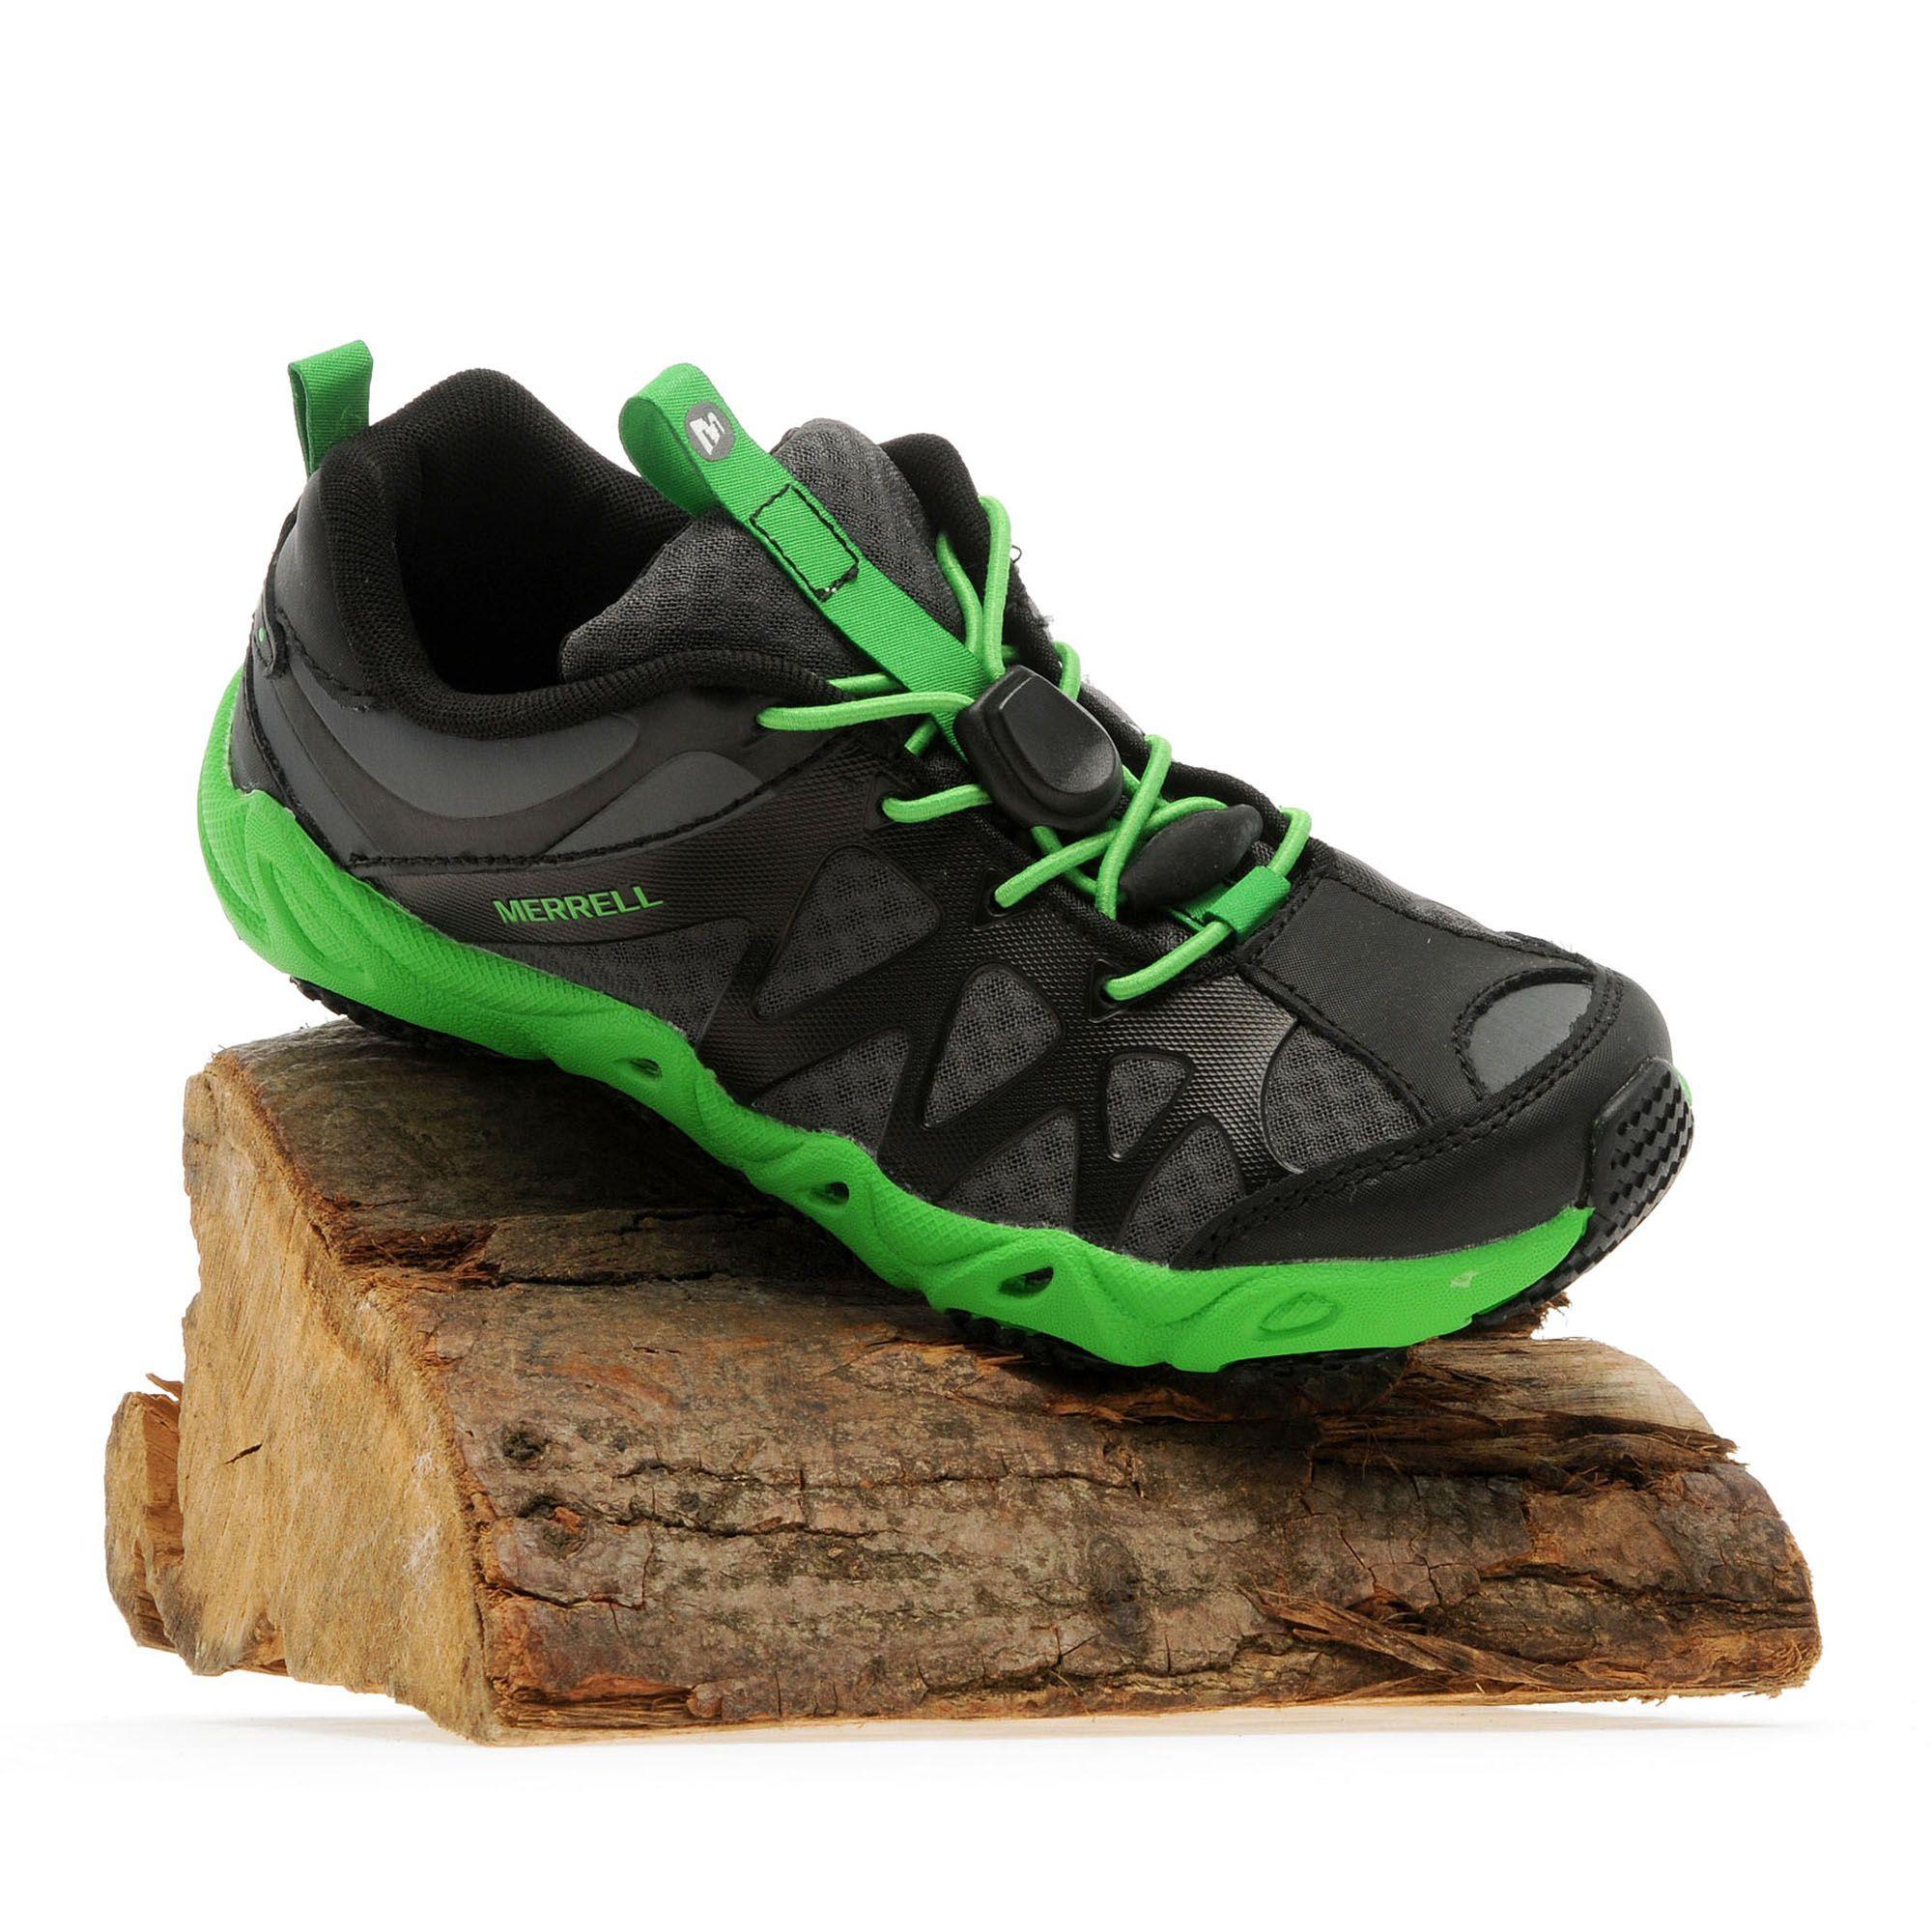 MERRELL Boy's Aquaterra Sprite Shoe